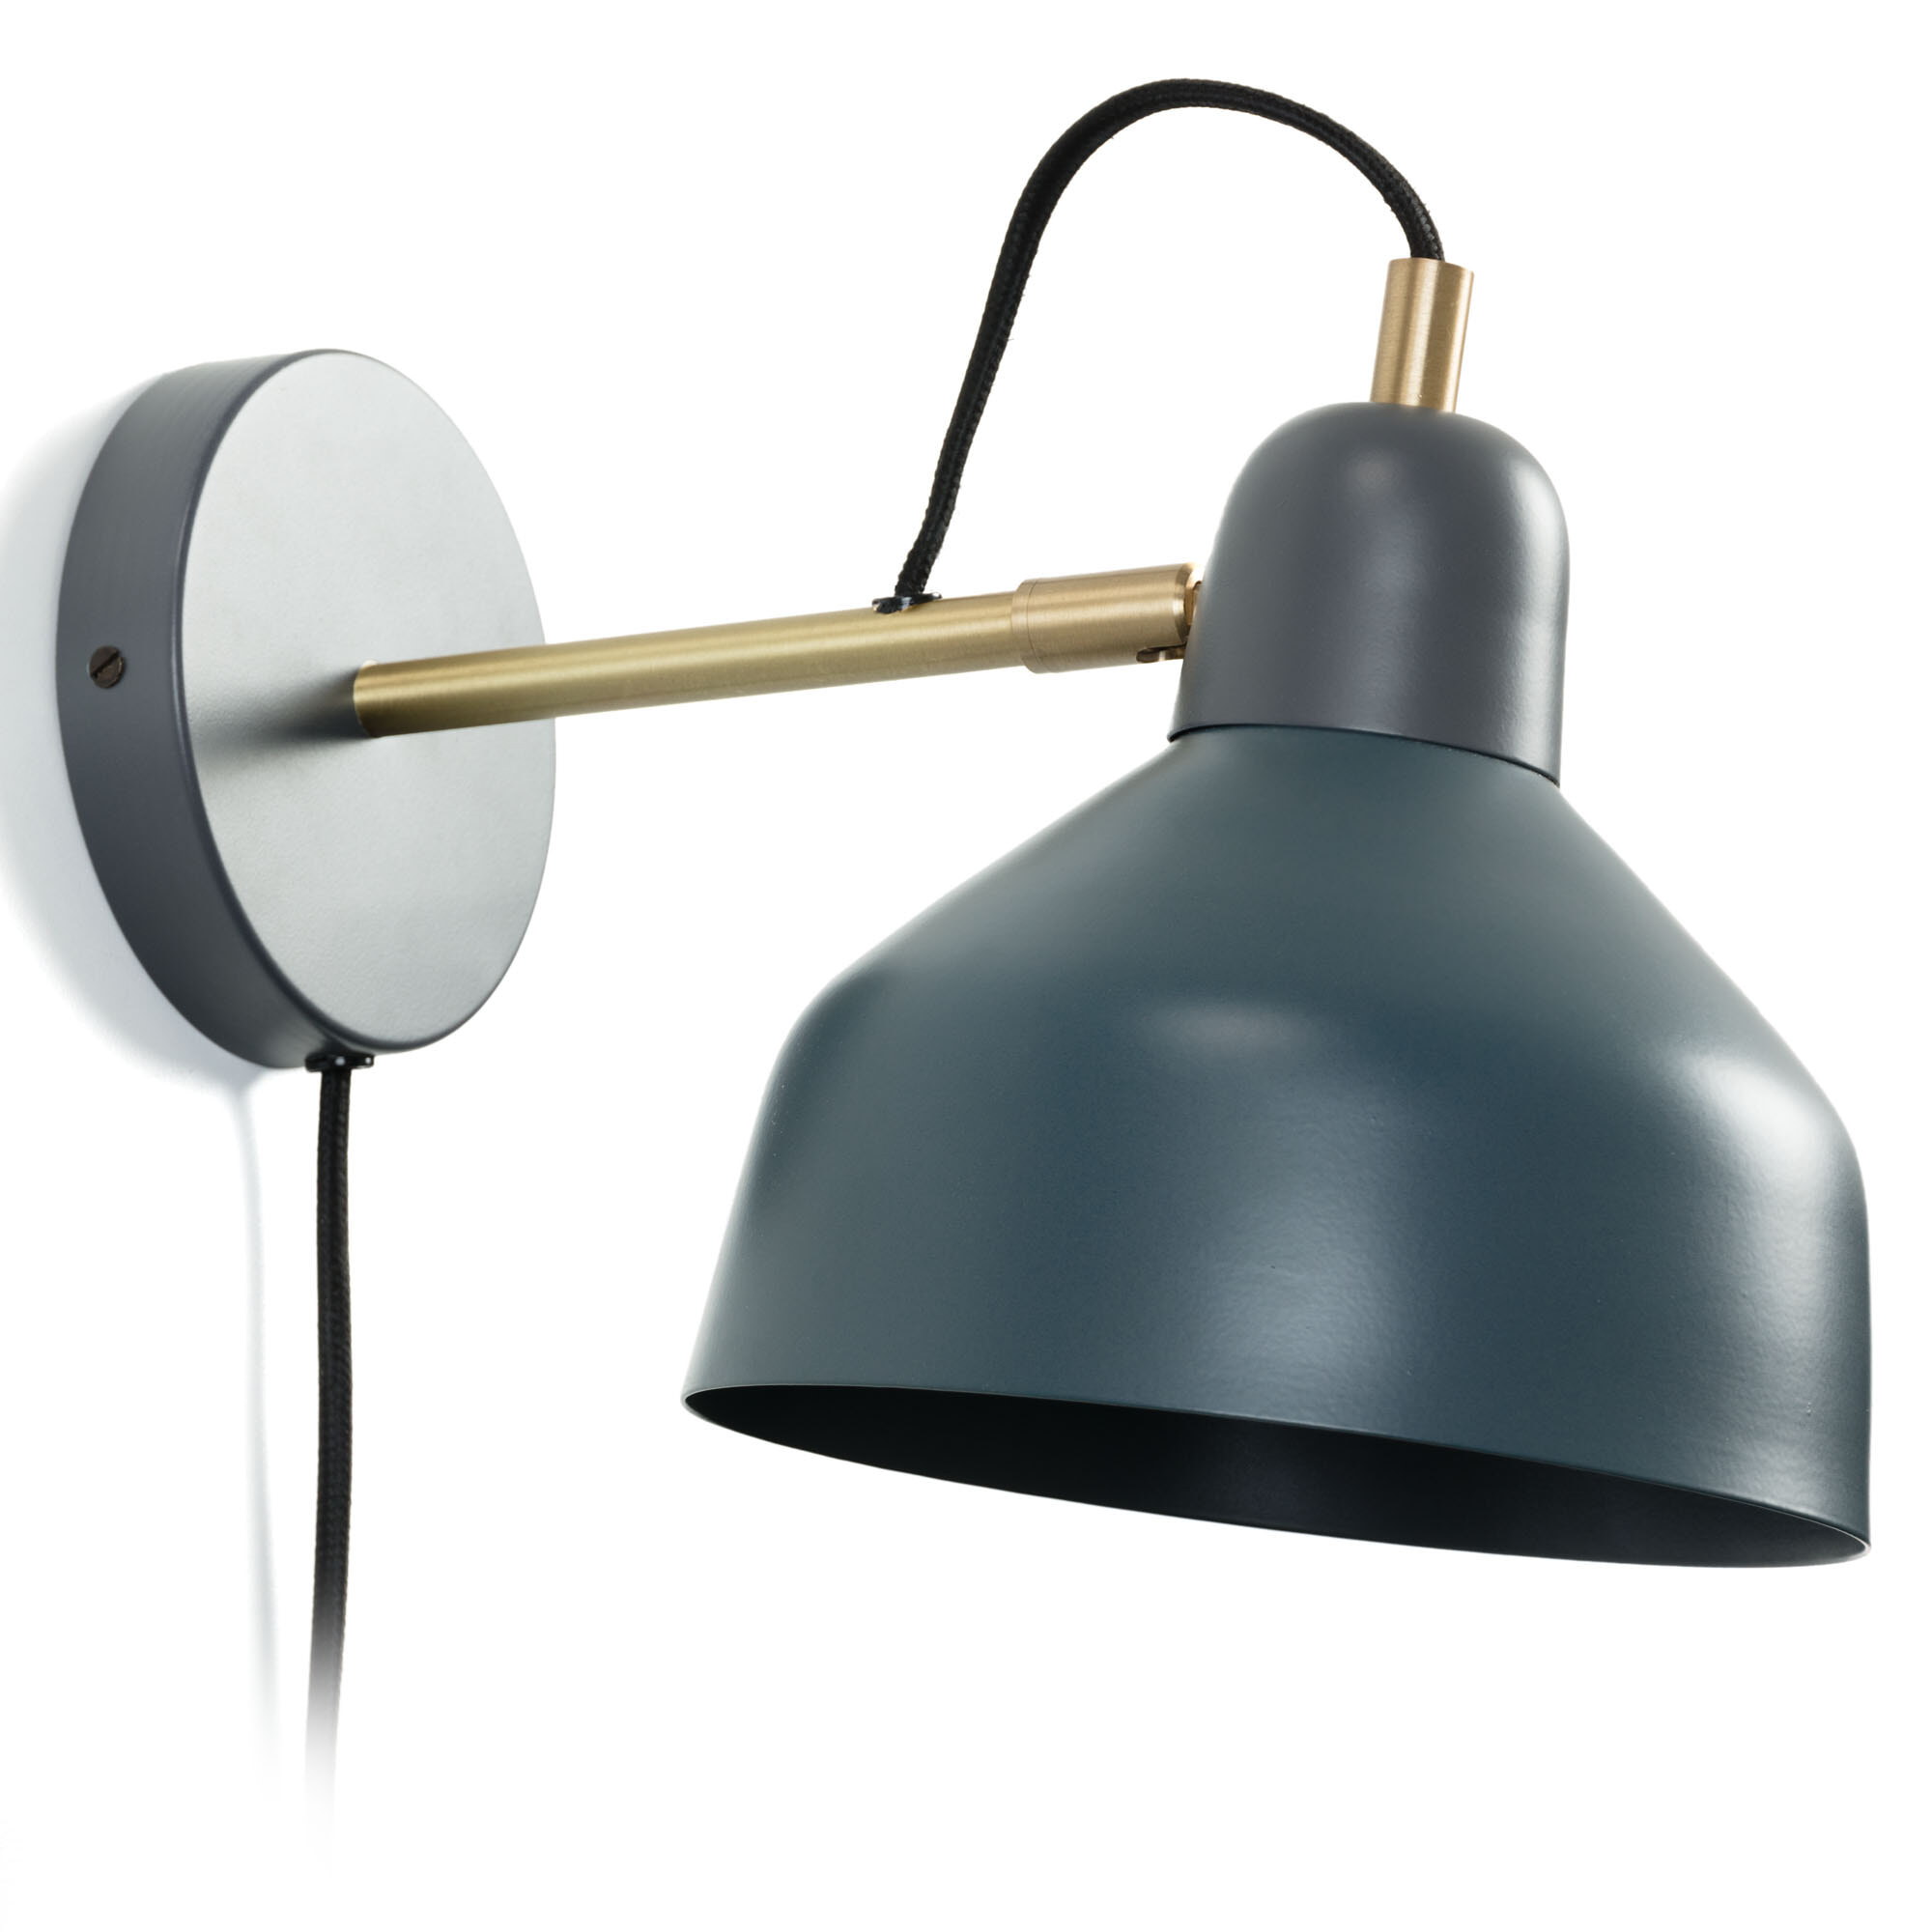 Kave Home Wandlamp 'Olimpia' Ø18,5cm, kleur Petrolblauw